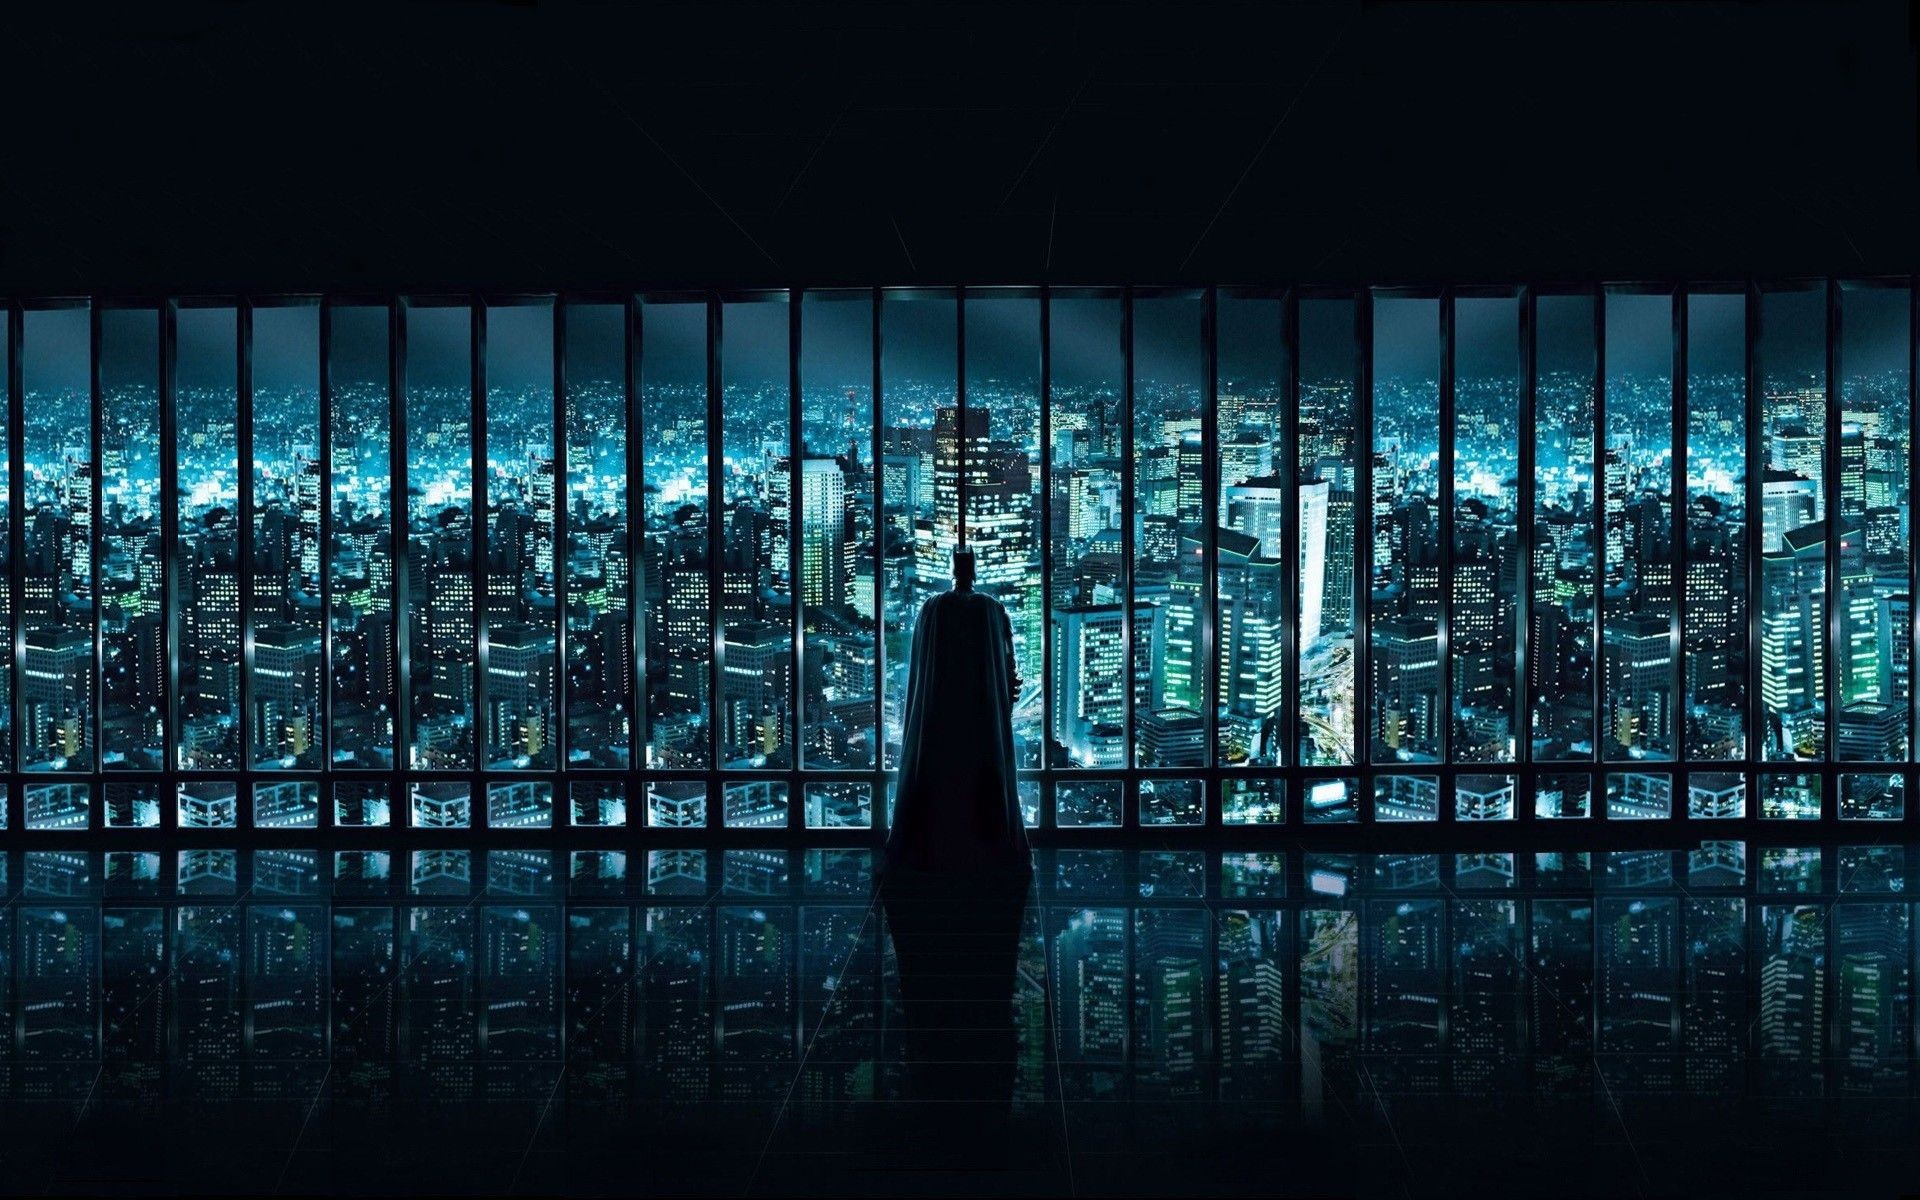 batman wallpaper 183�� download free amazing hd wallpapers of